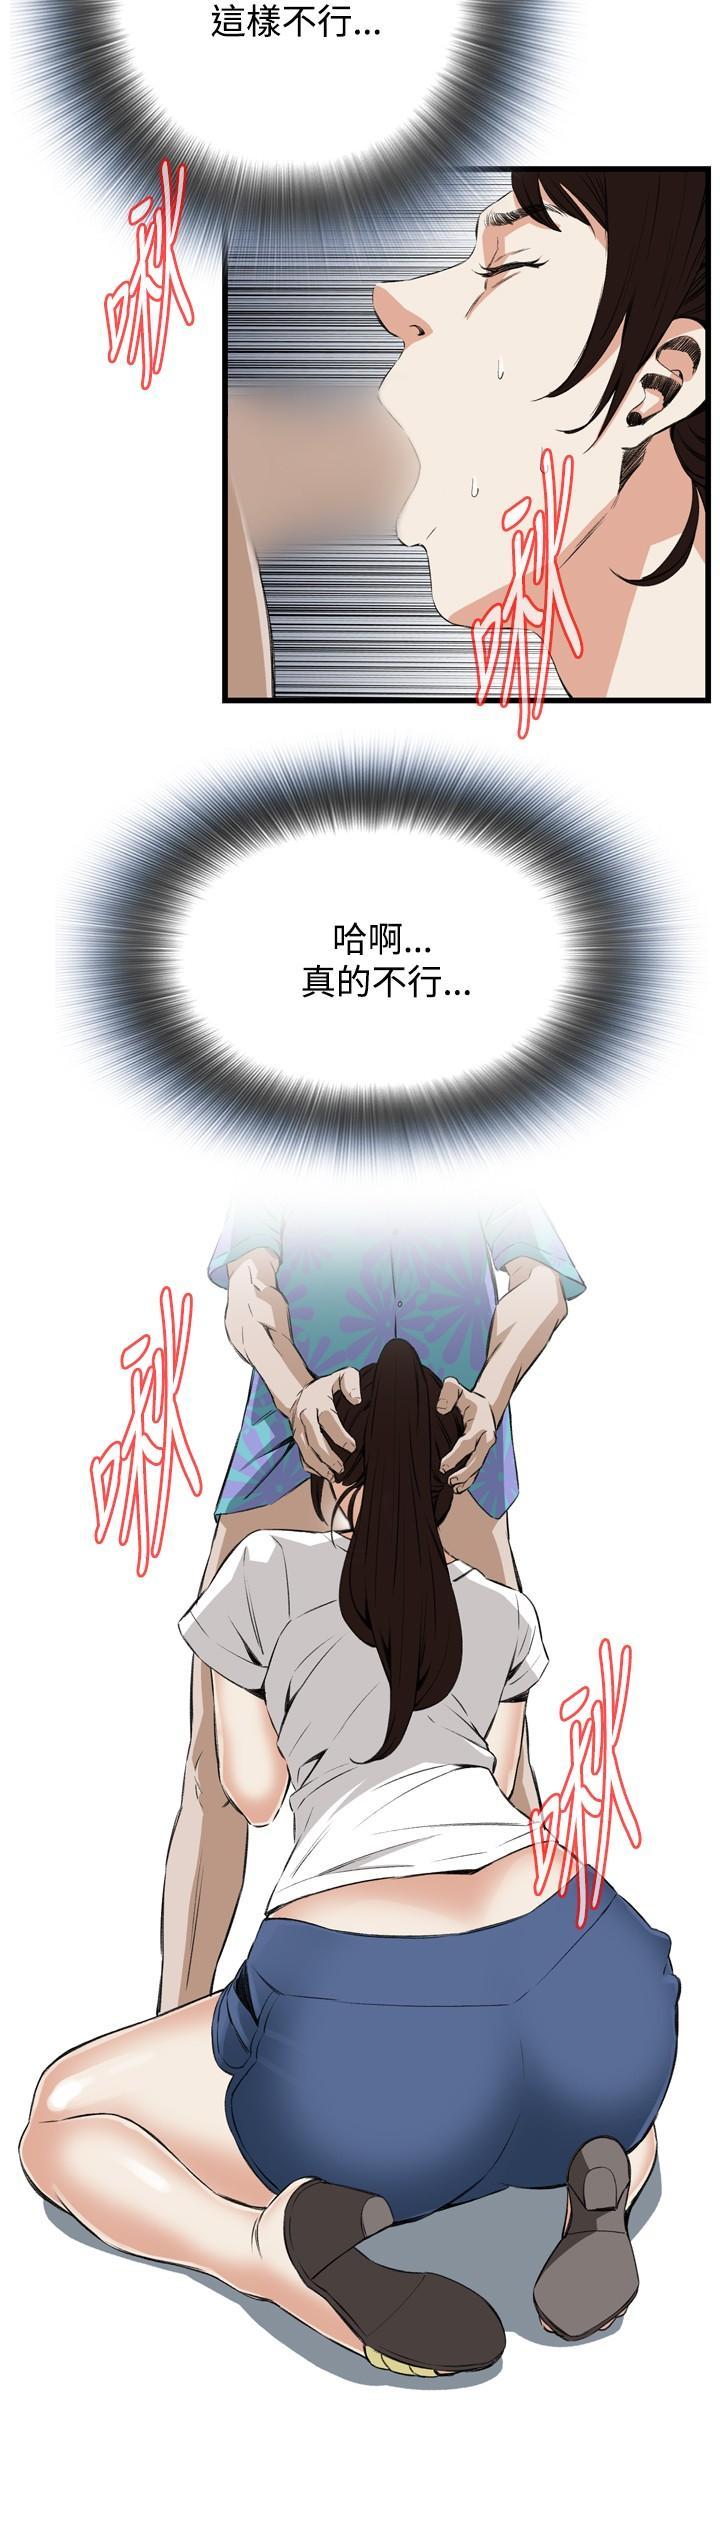 Take a Peek 偷窥 Ch.39~55 [Chinese]中文 358